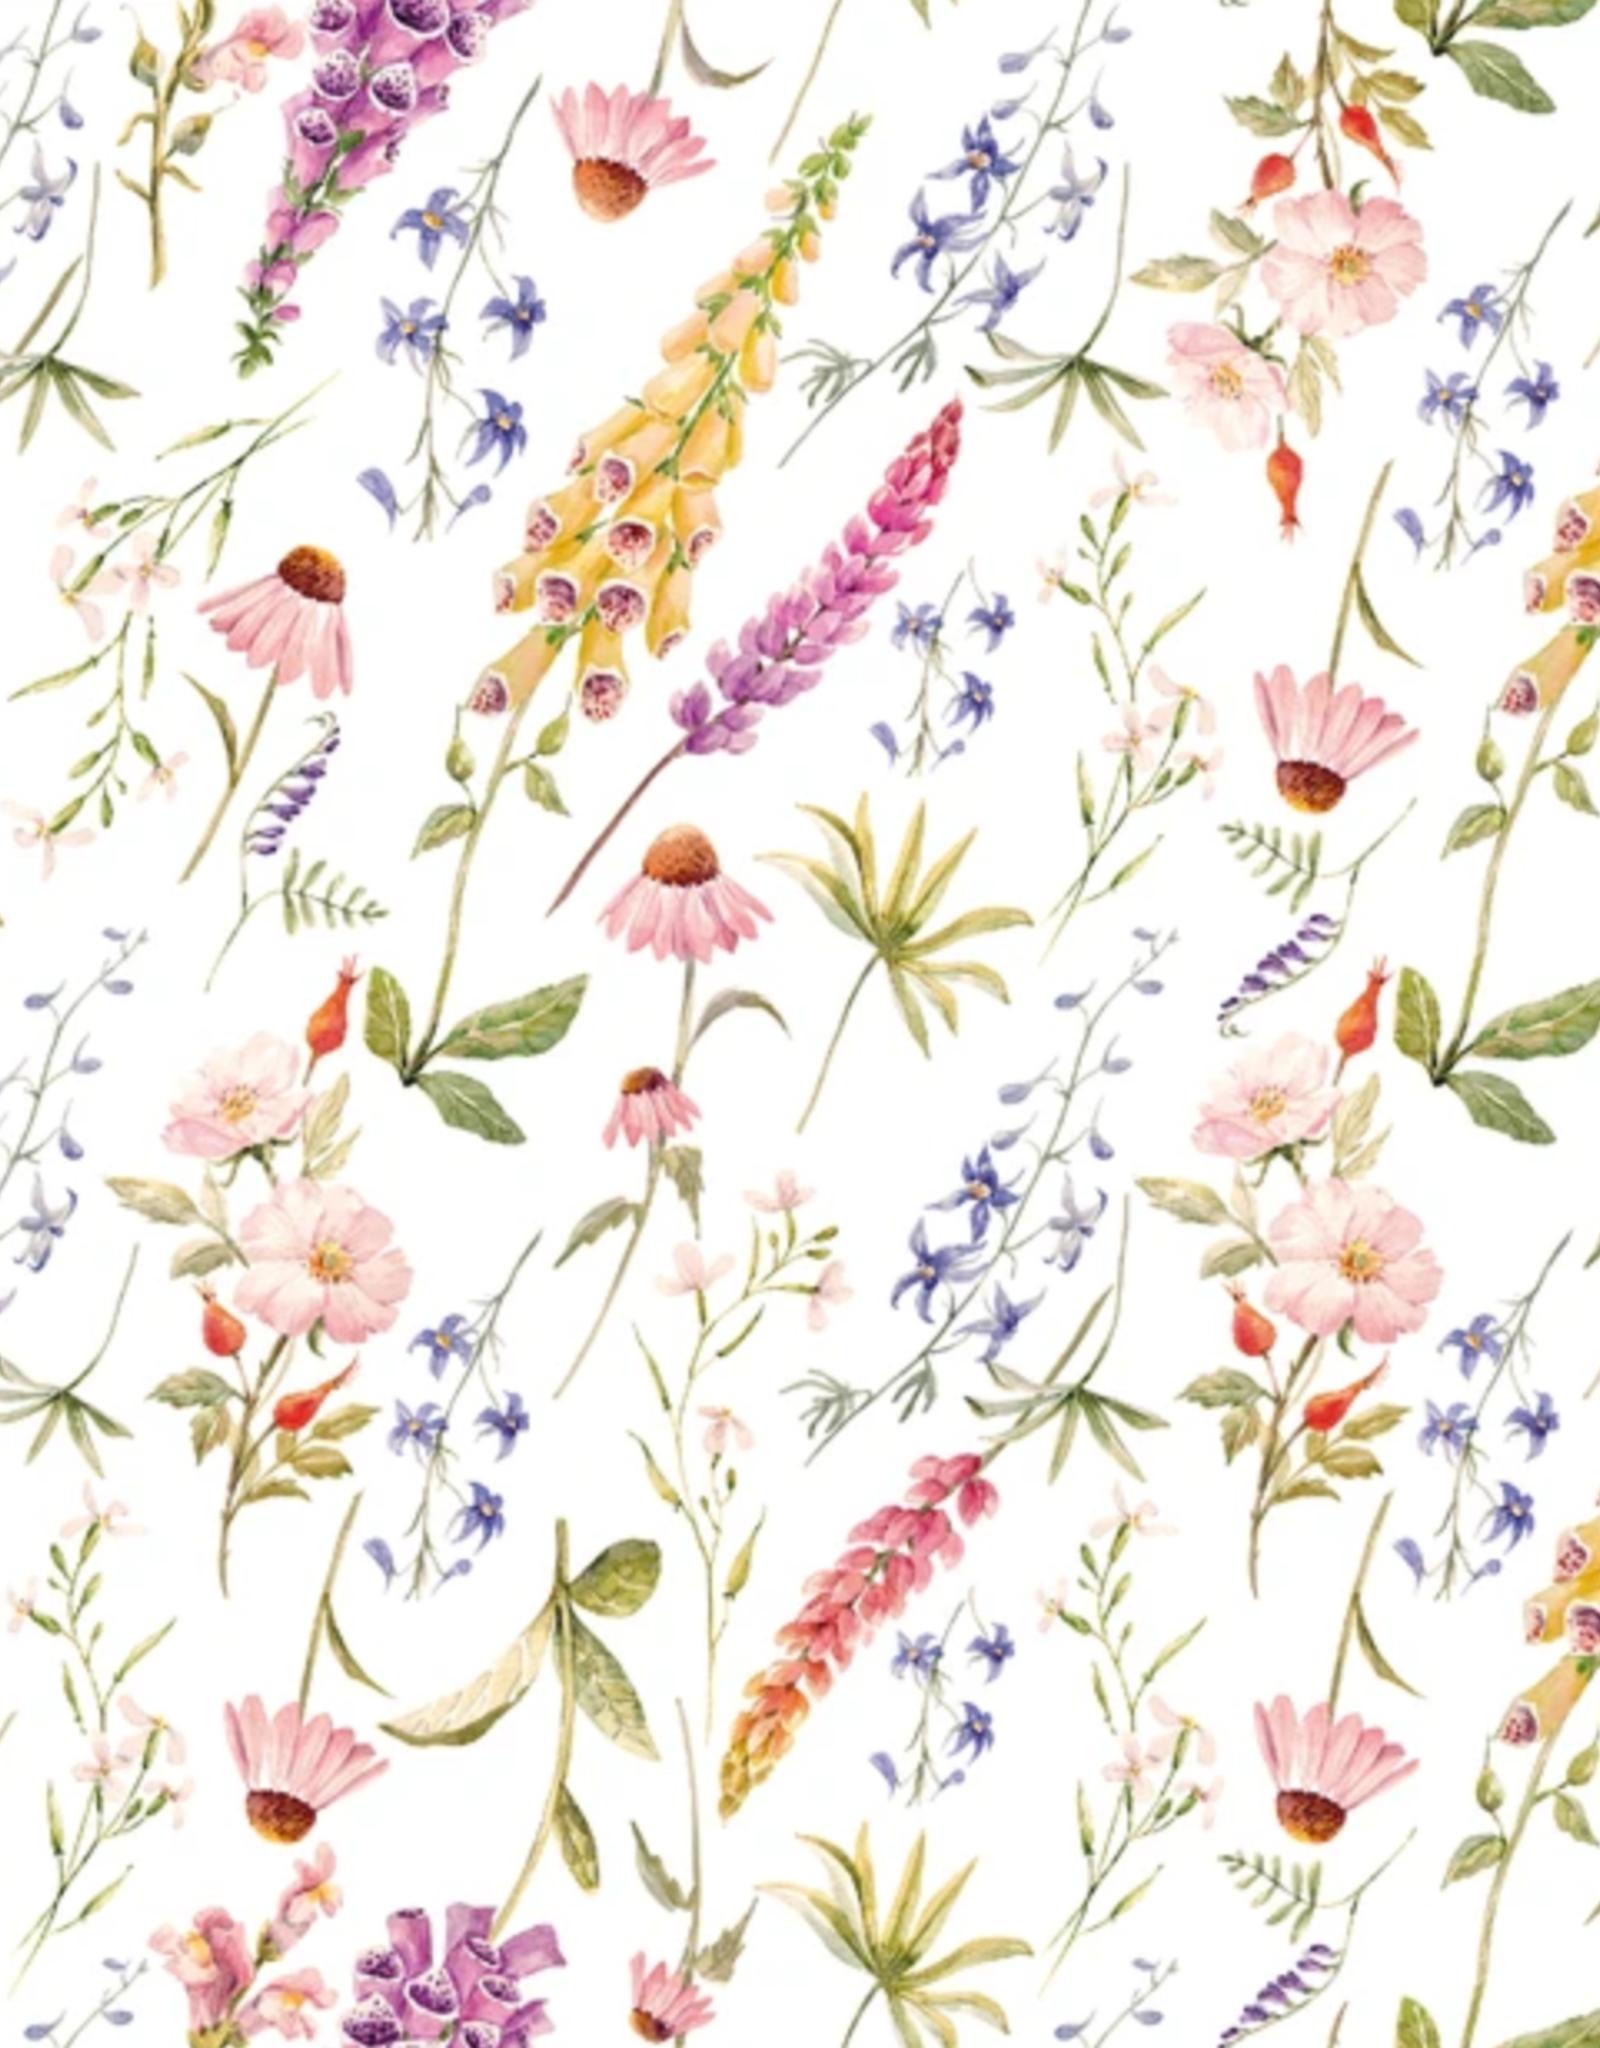 Tricot - Flowerfield